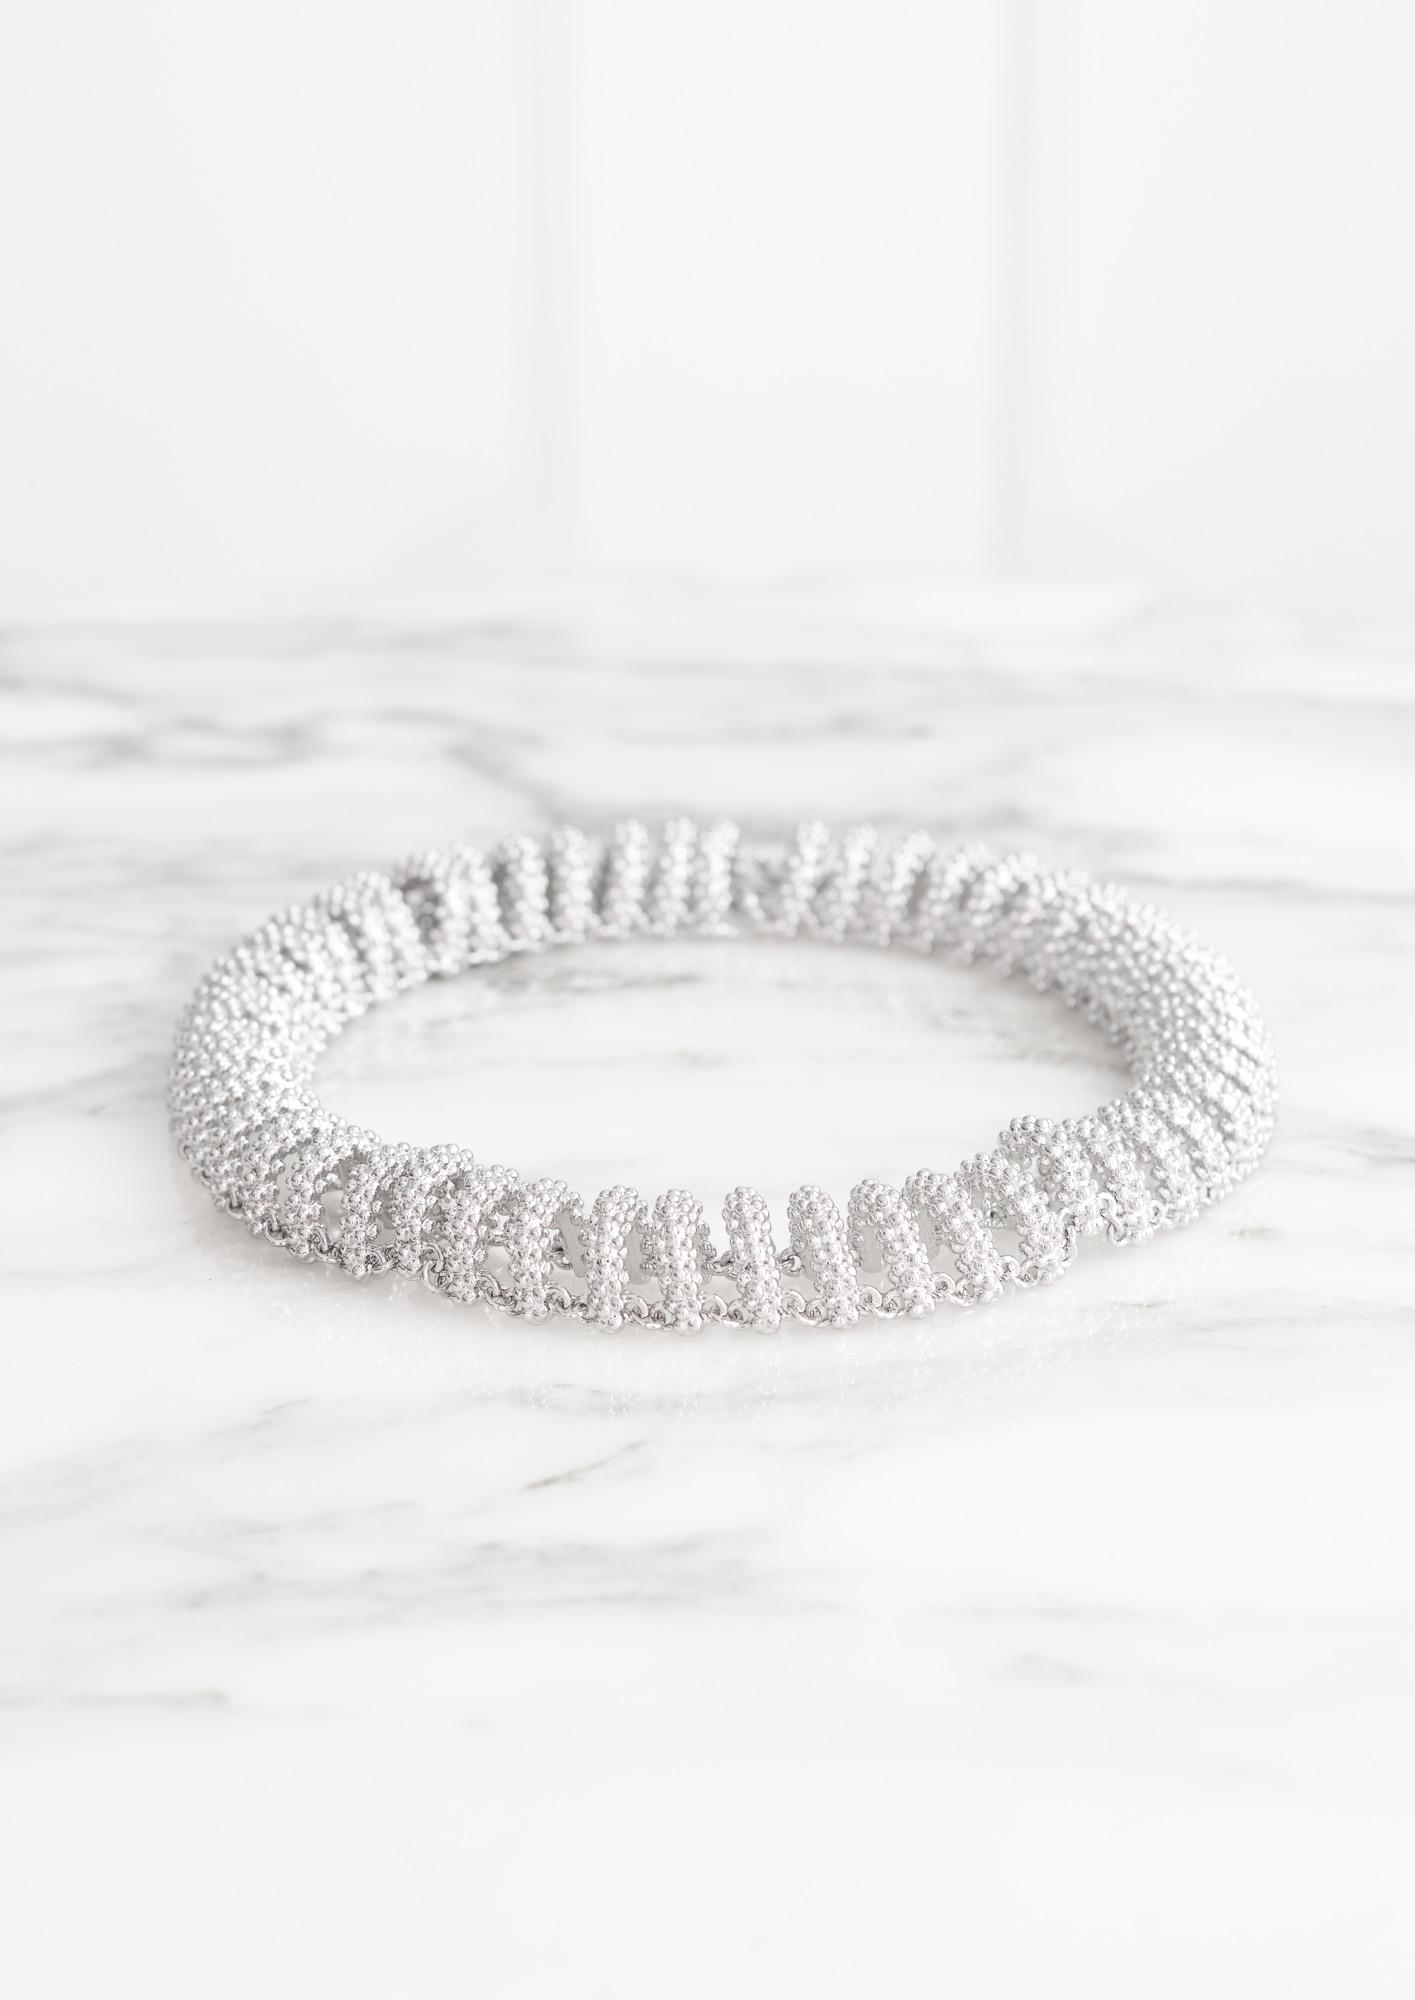 Balenciaga-Chain Bubble Track Necklace Palladium- Departement Feminin